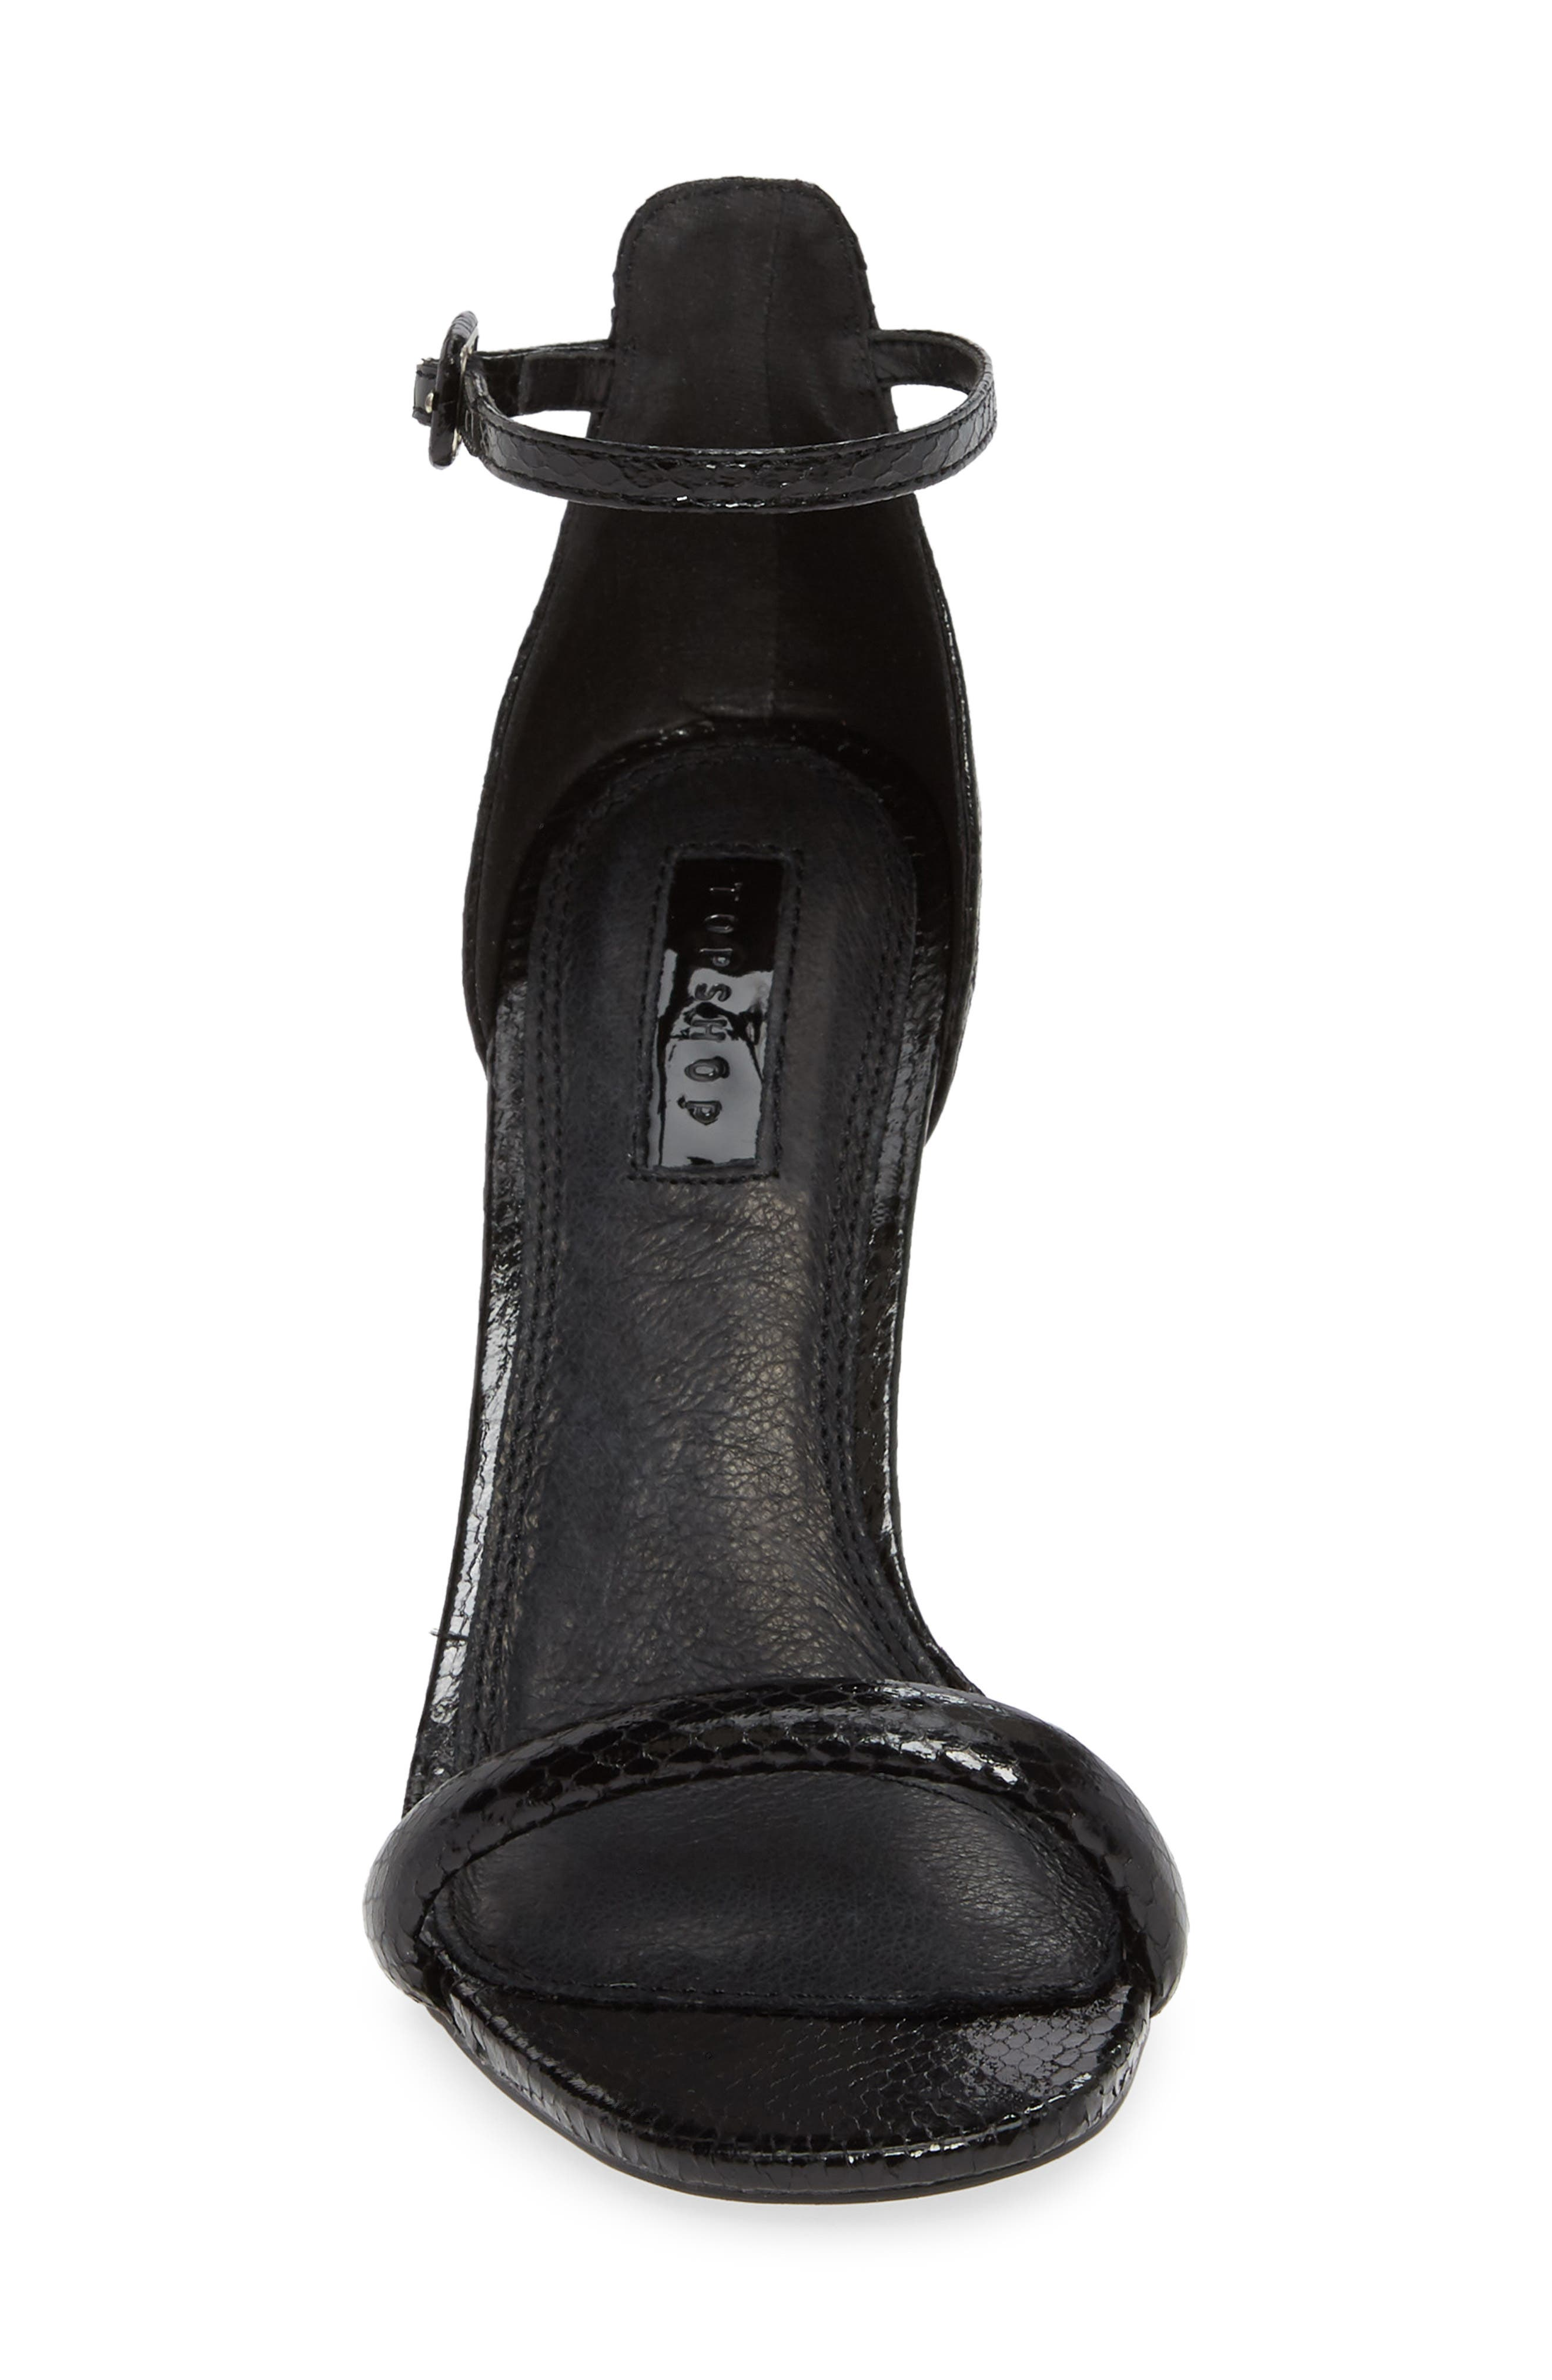 TOPSHOP, Robyn Ankle Strap Sandal, Alternate thumbnail 4, color, BLACK